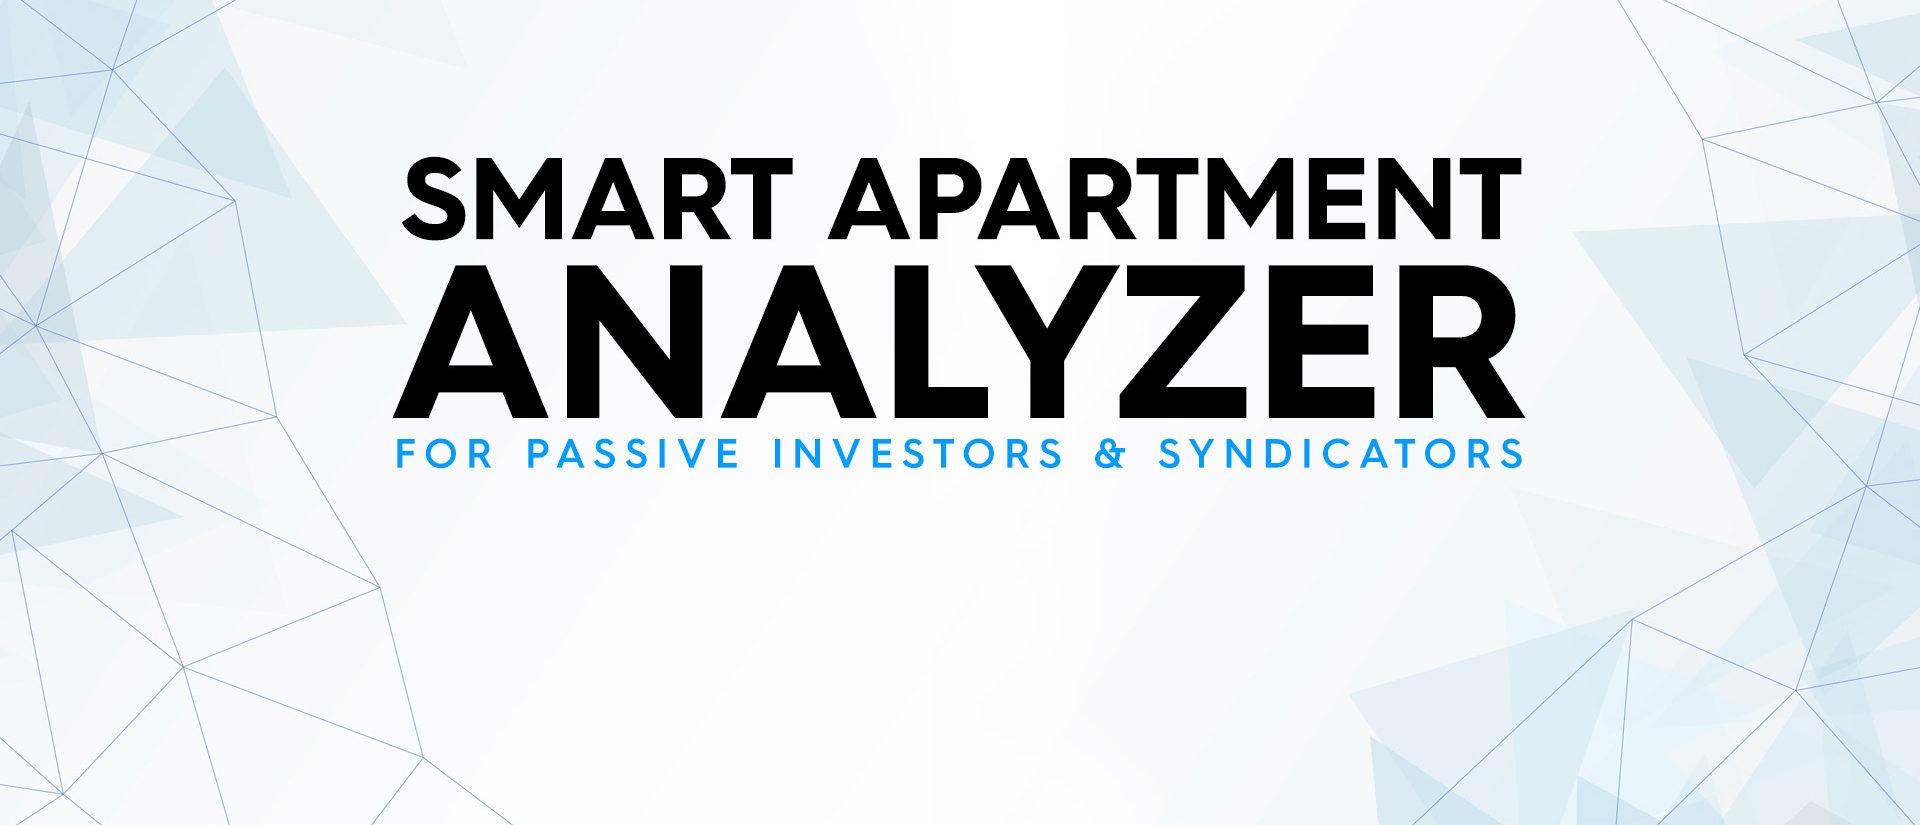 Smart Apartment Analyzer - Think Multifamily